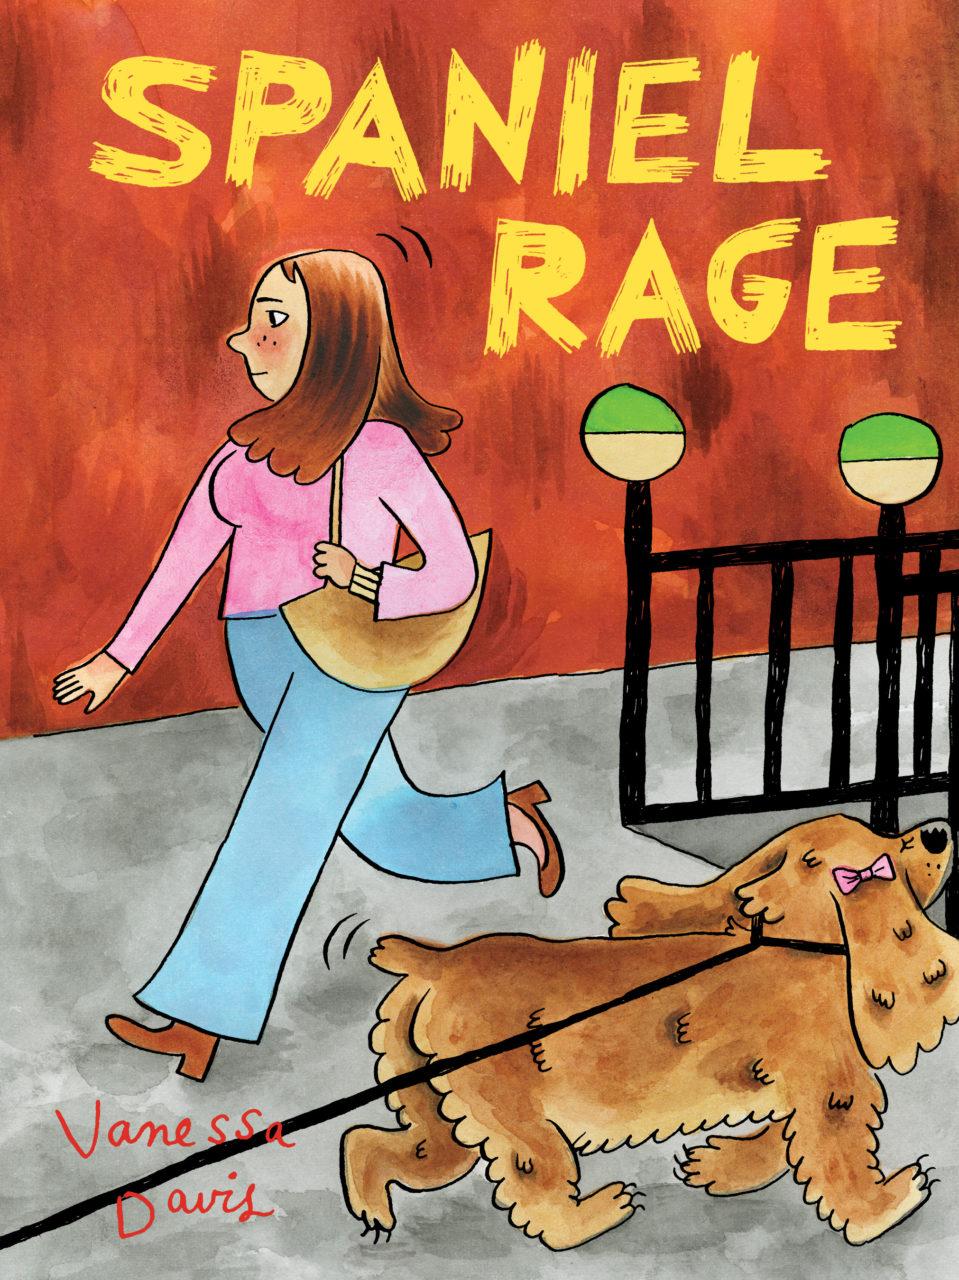 Review: Vanessa Davis' Spaniel Rage